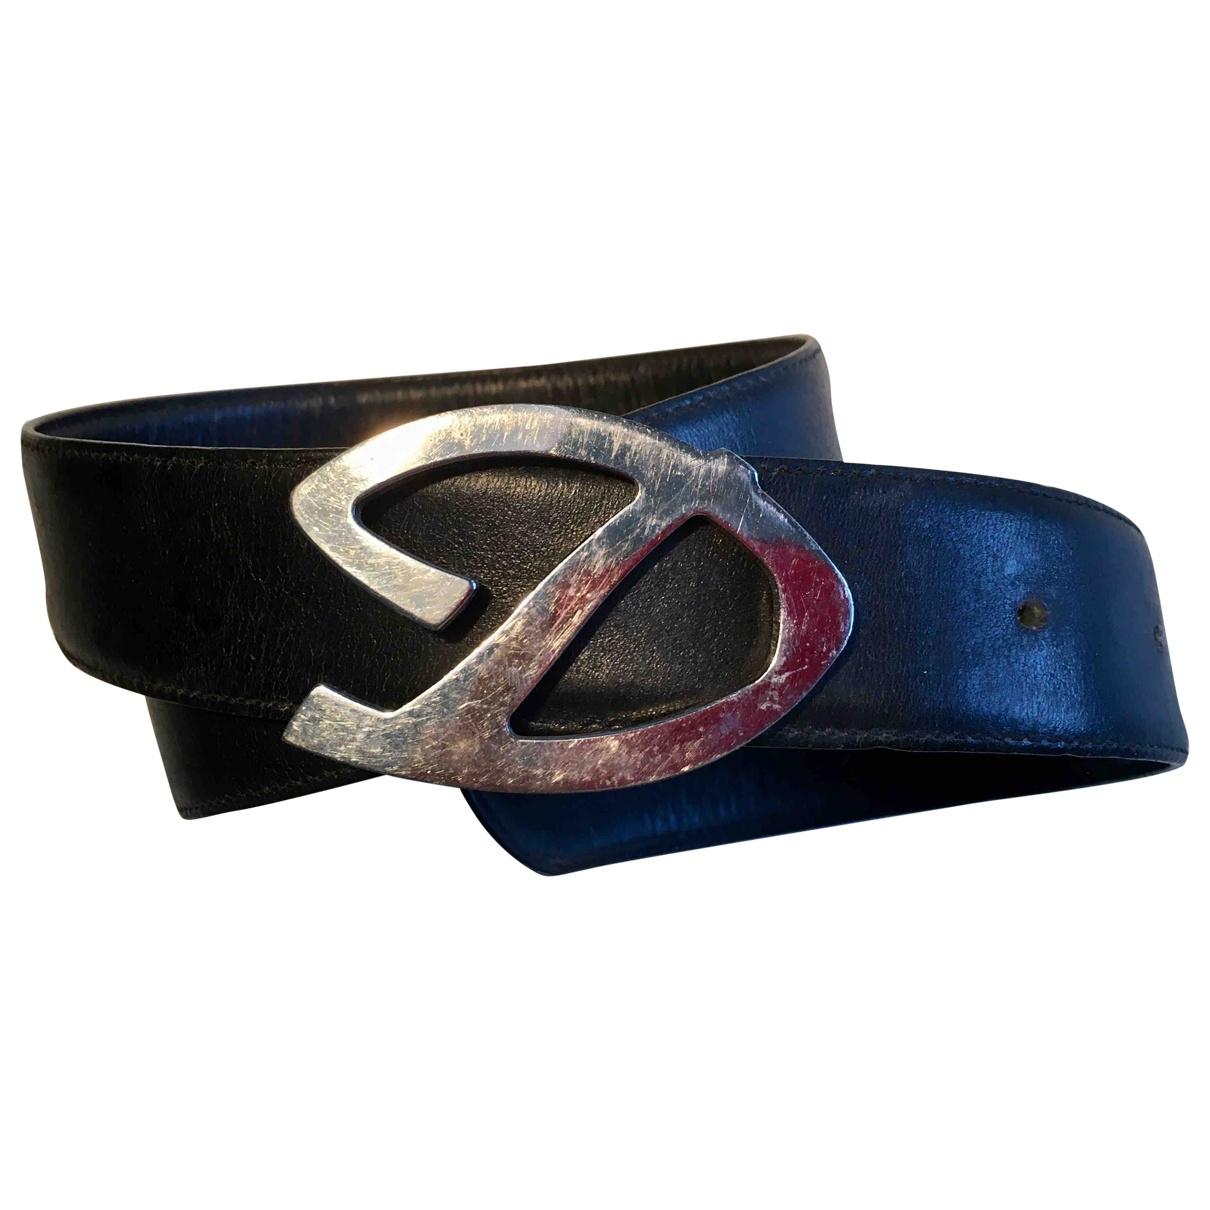 Cinturon de Cuero S.t. Dupont